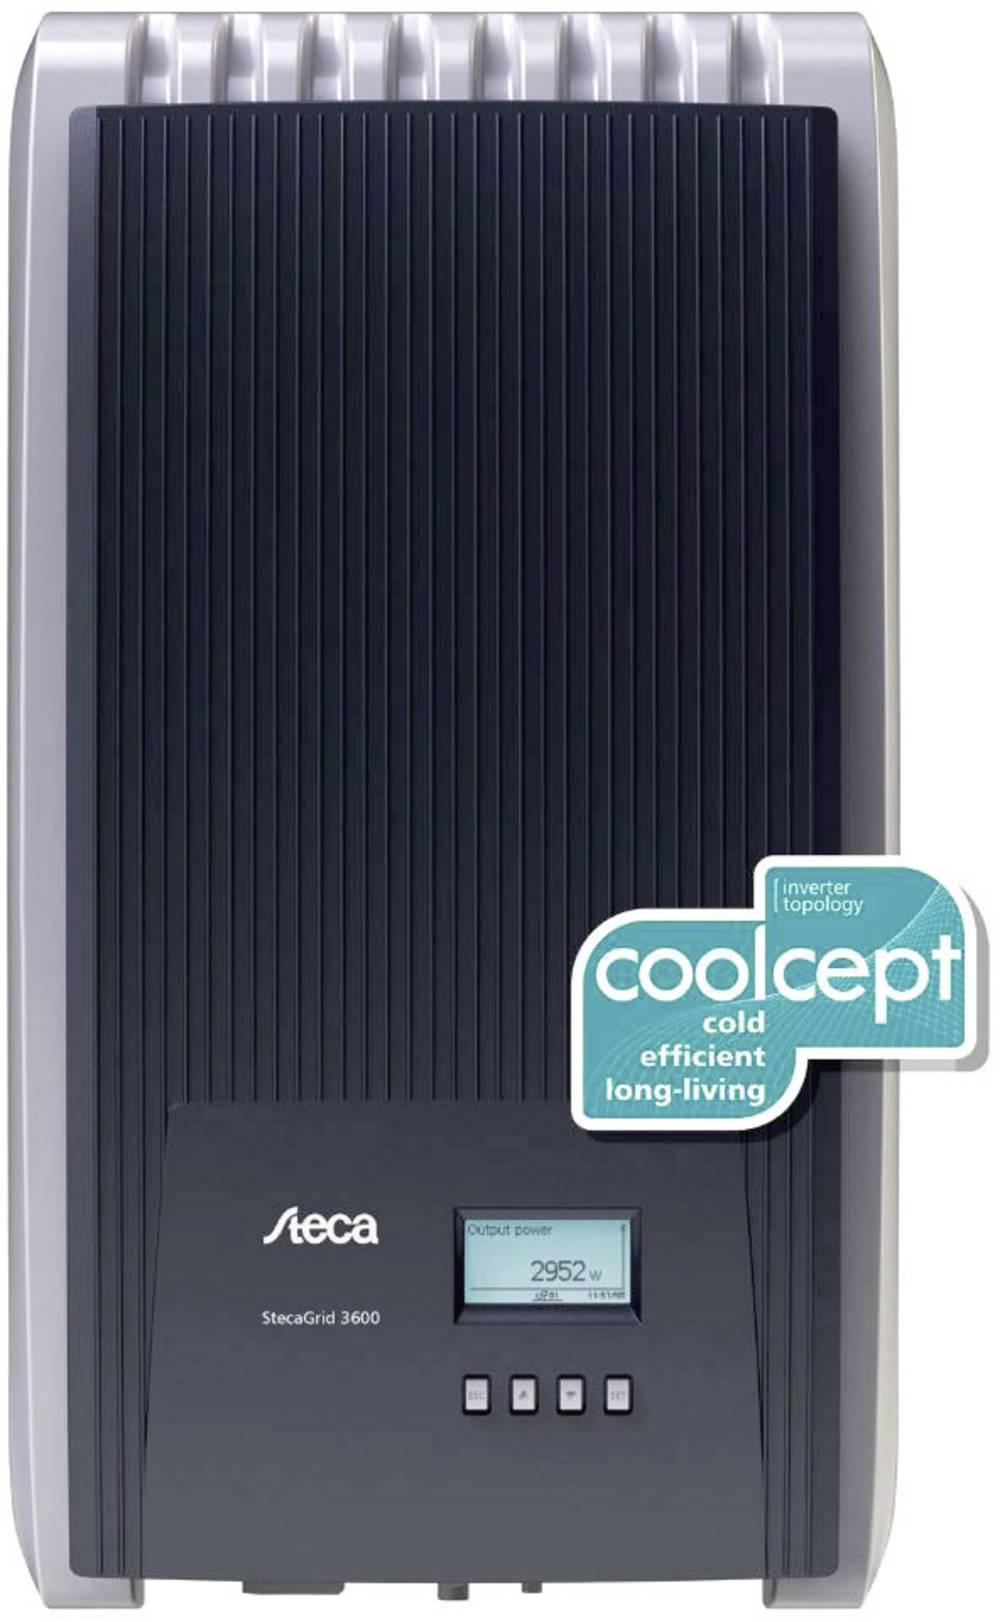 Strømvekselretter Steca Grid Inverter StecaGrid Coolcept 3010